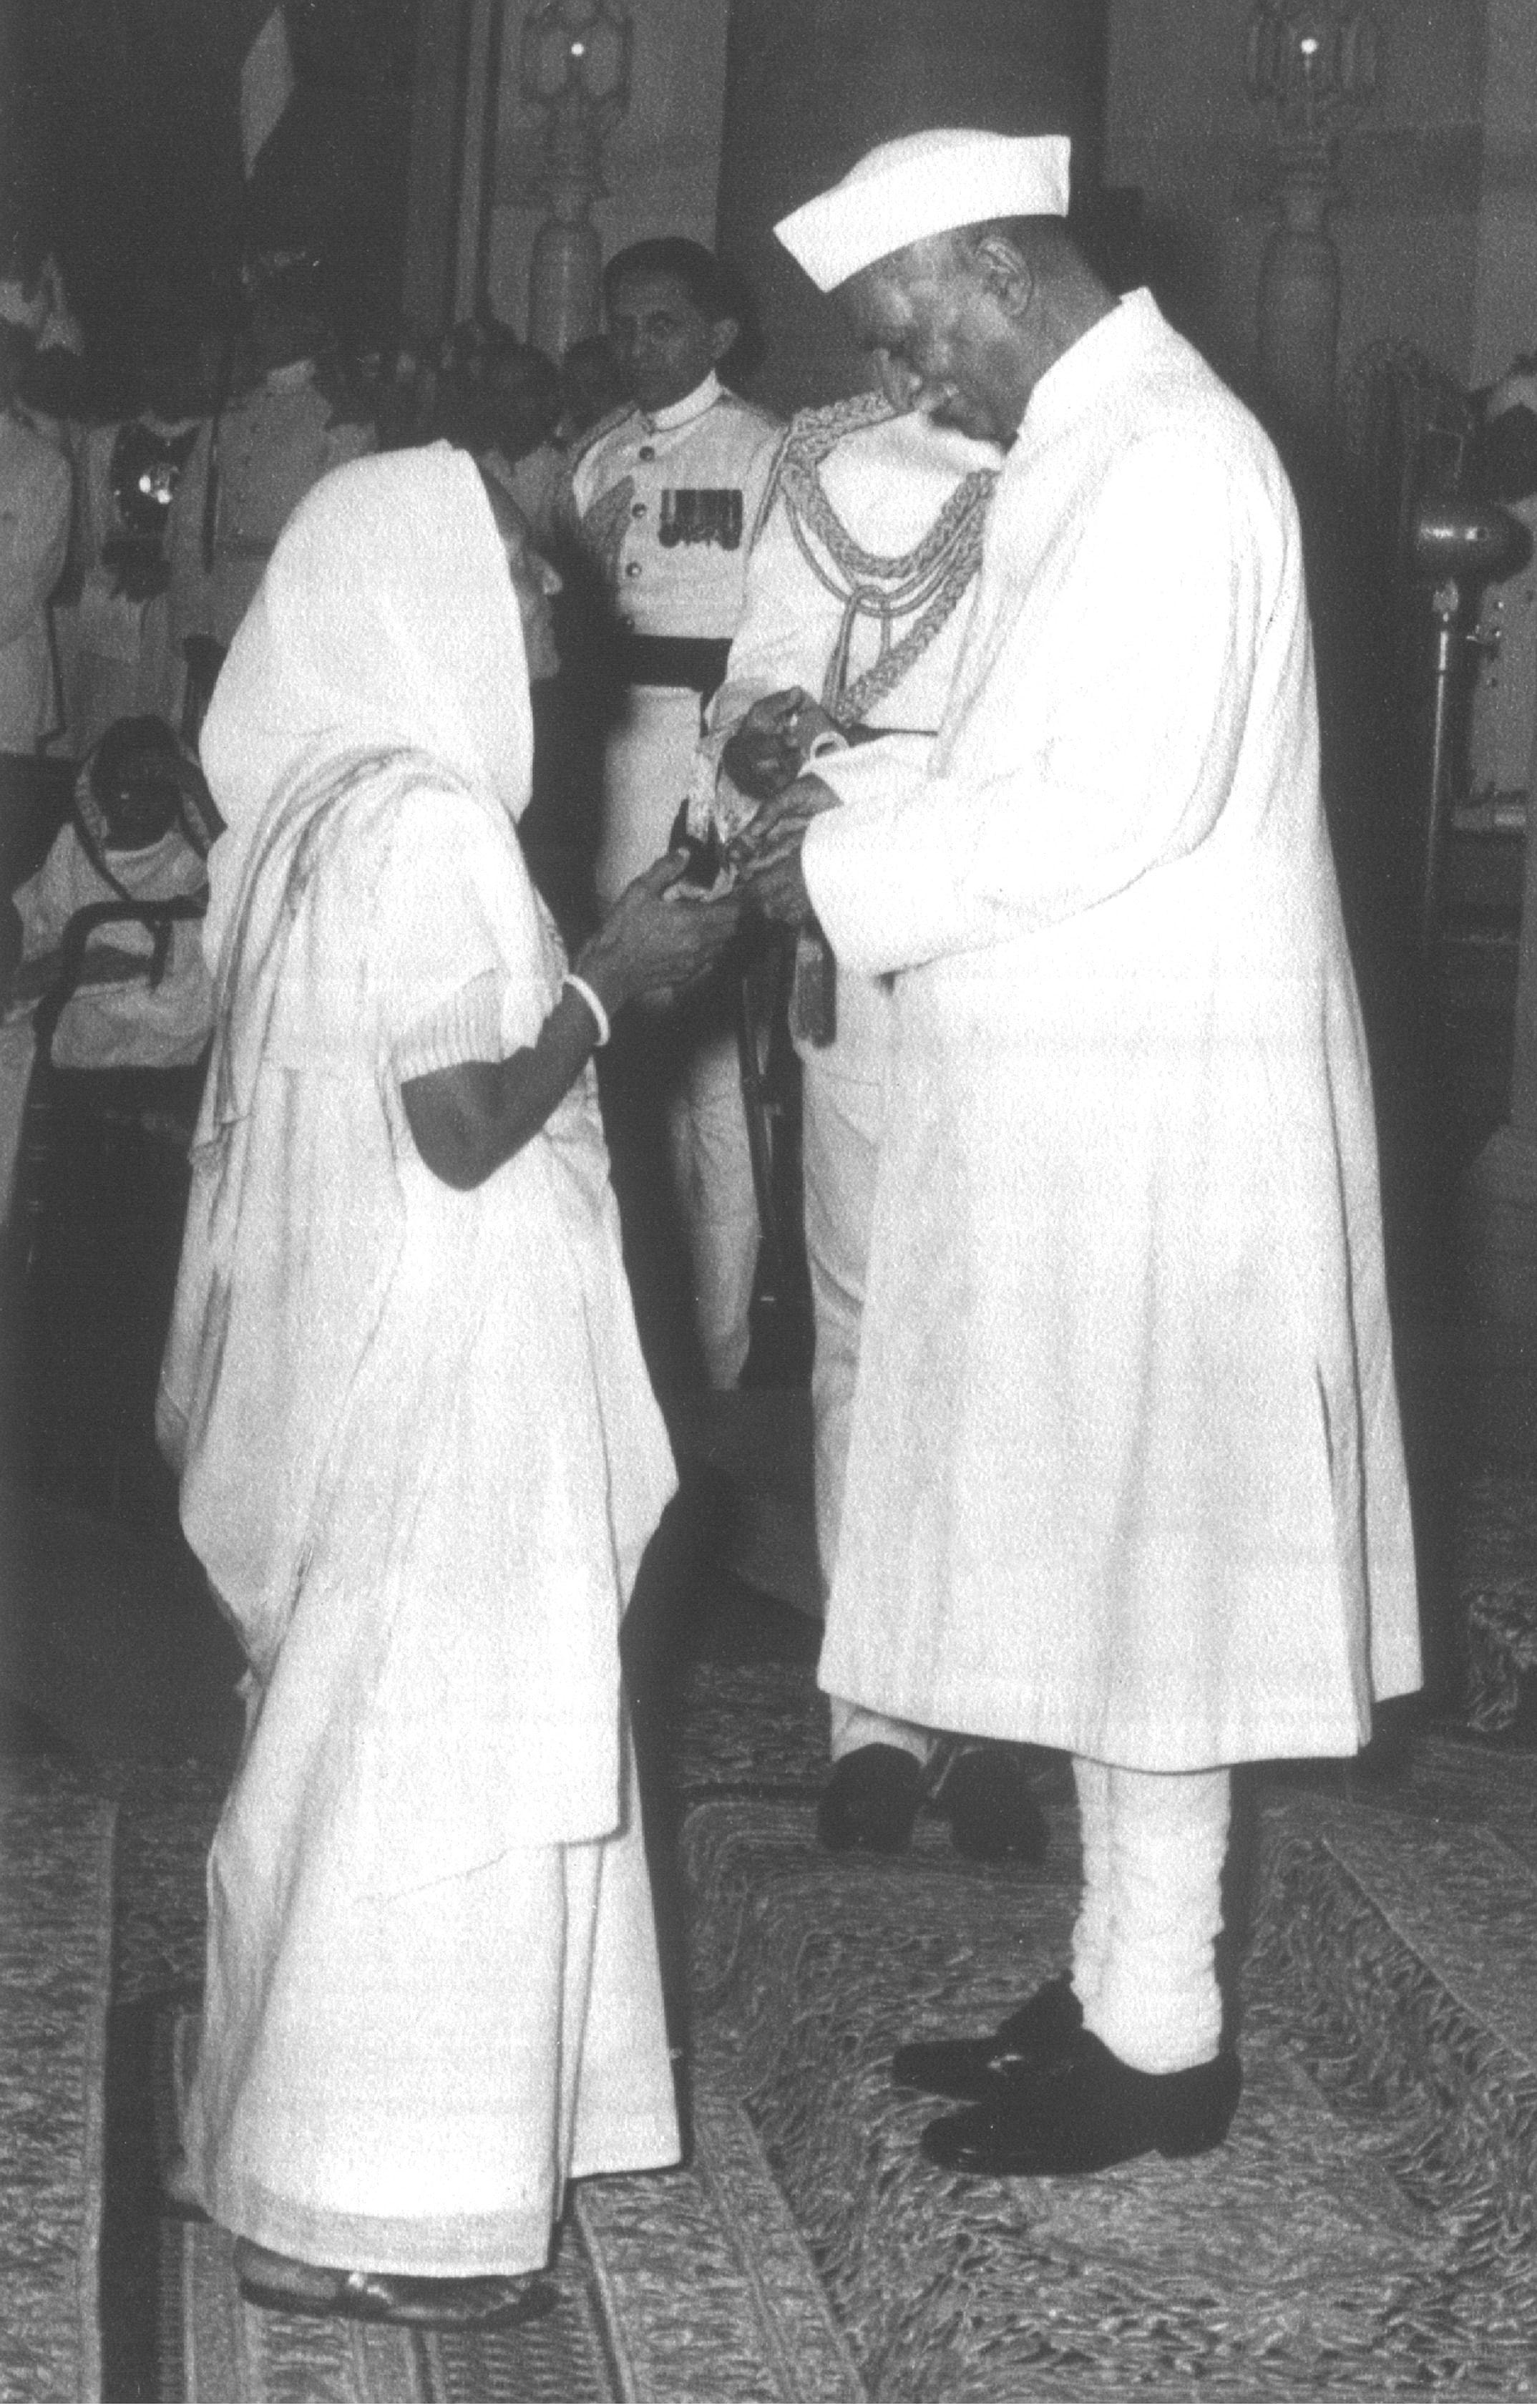 Smt. Jankideviji Bajaj receiving 'Padma Vibhushan', from President of India Dr. Rajendra Prasad.